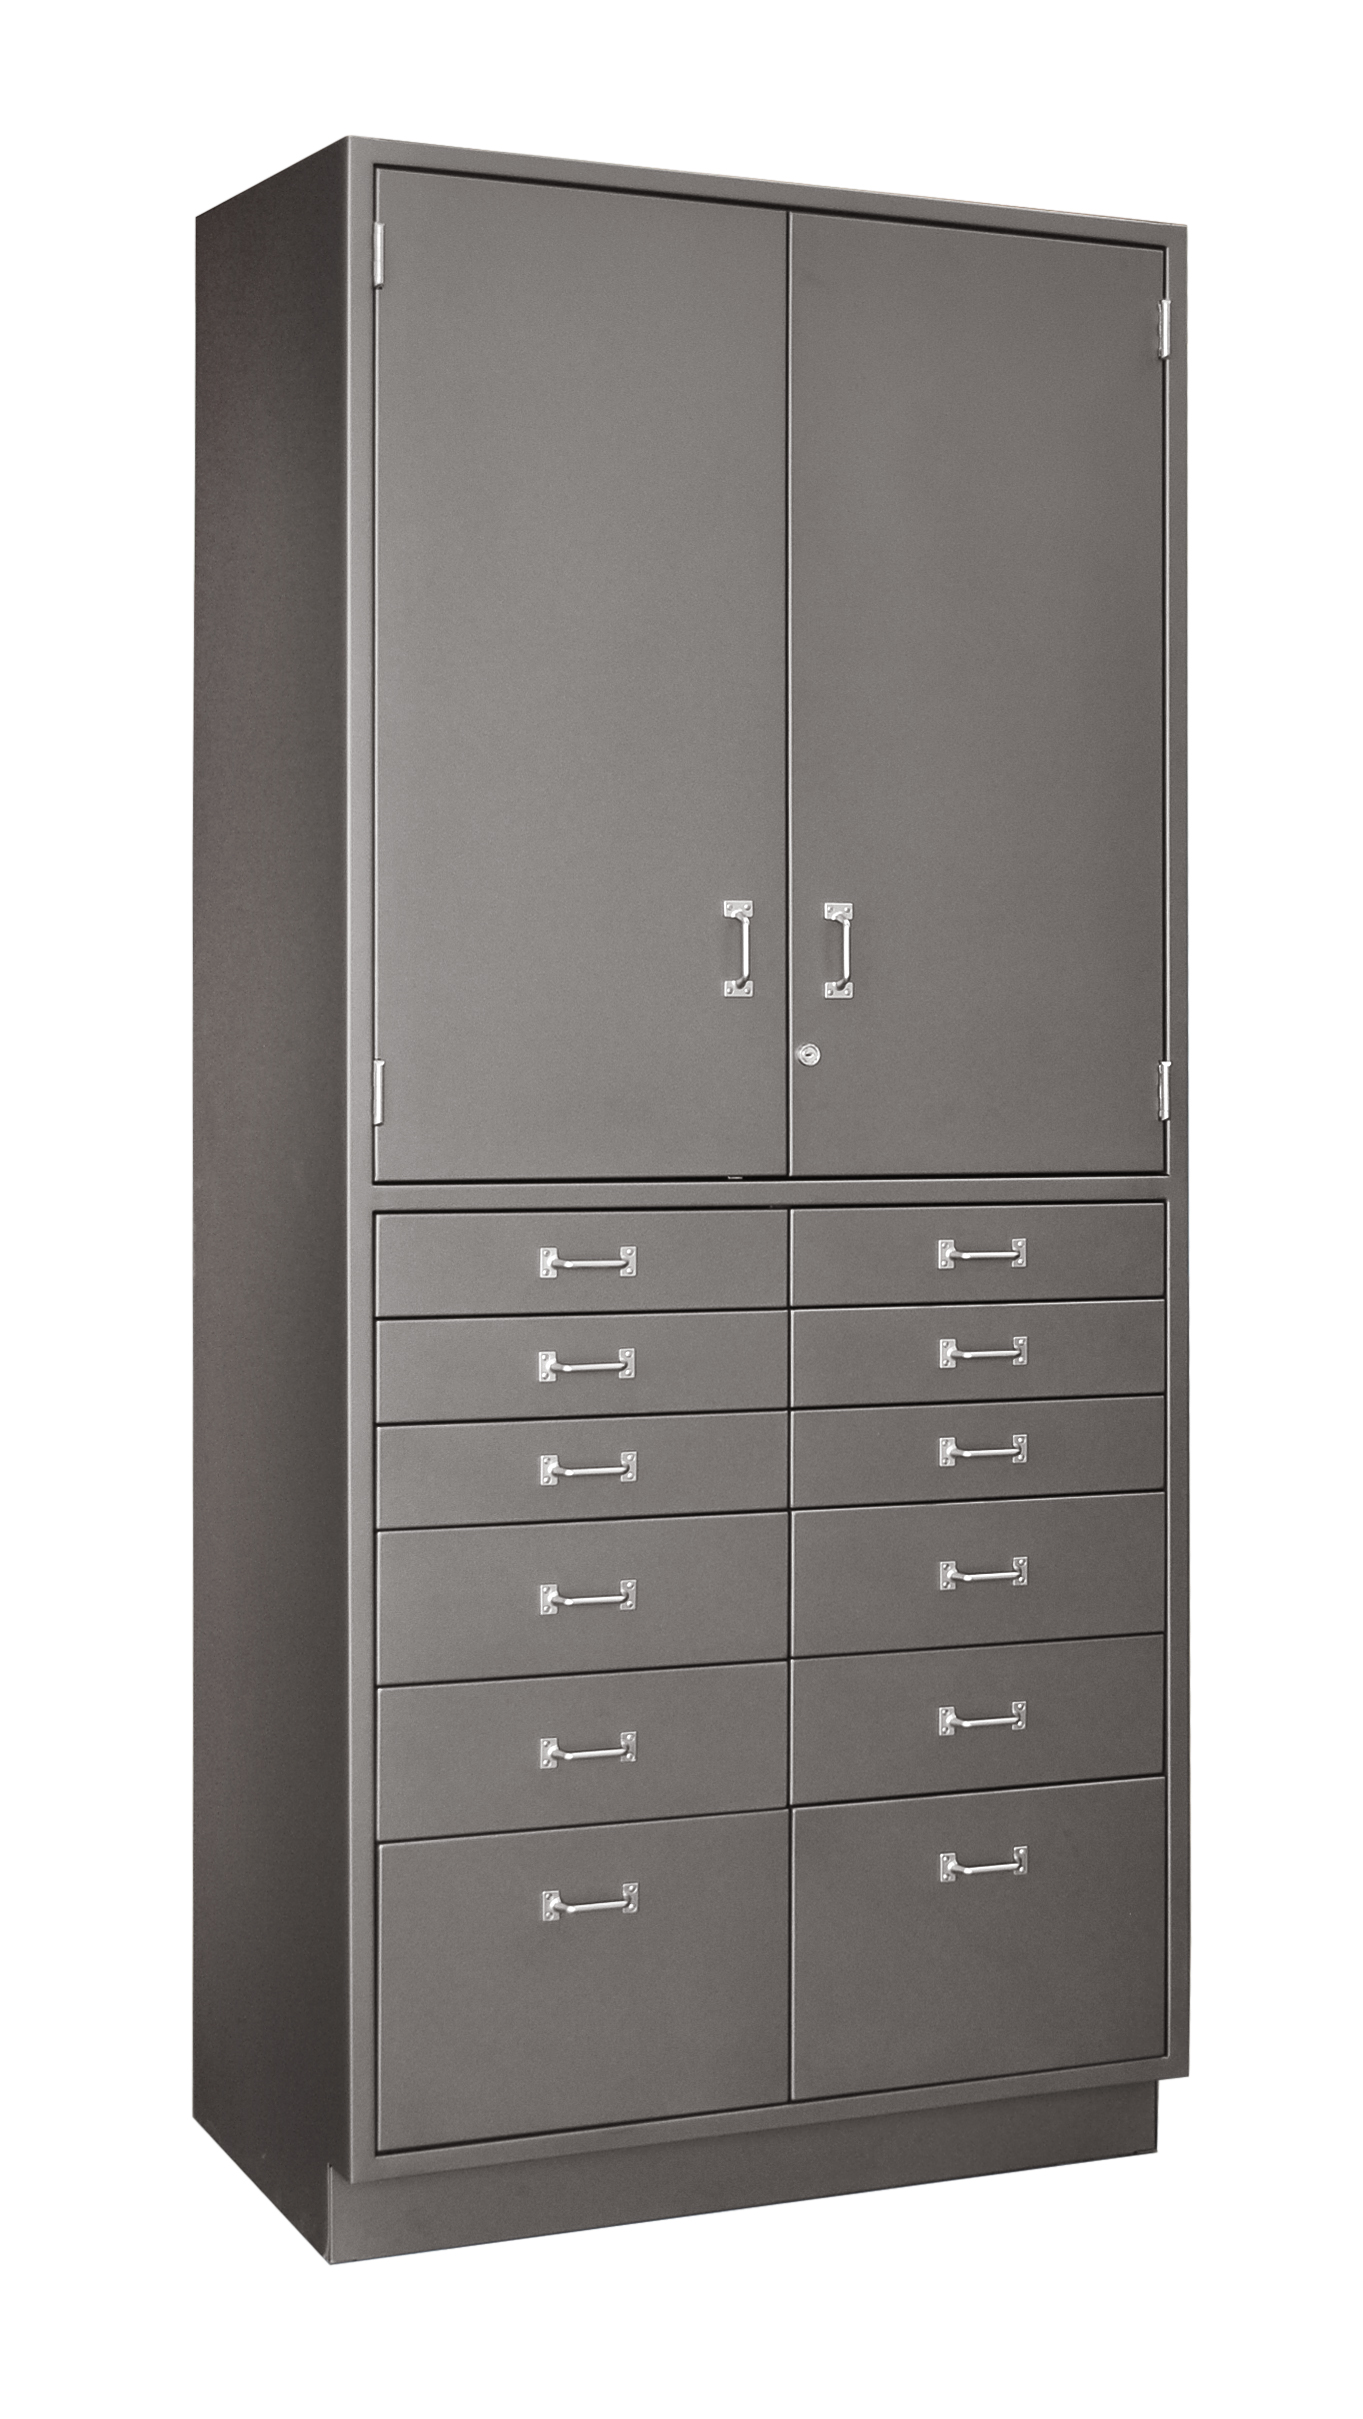 Hybrid 12drw-2dr cabinet- warm gray